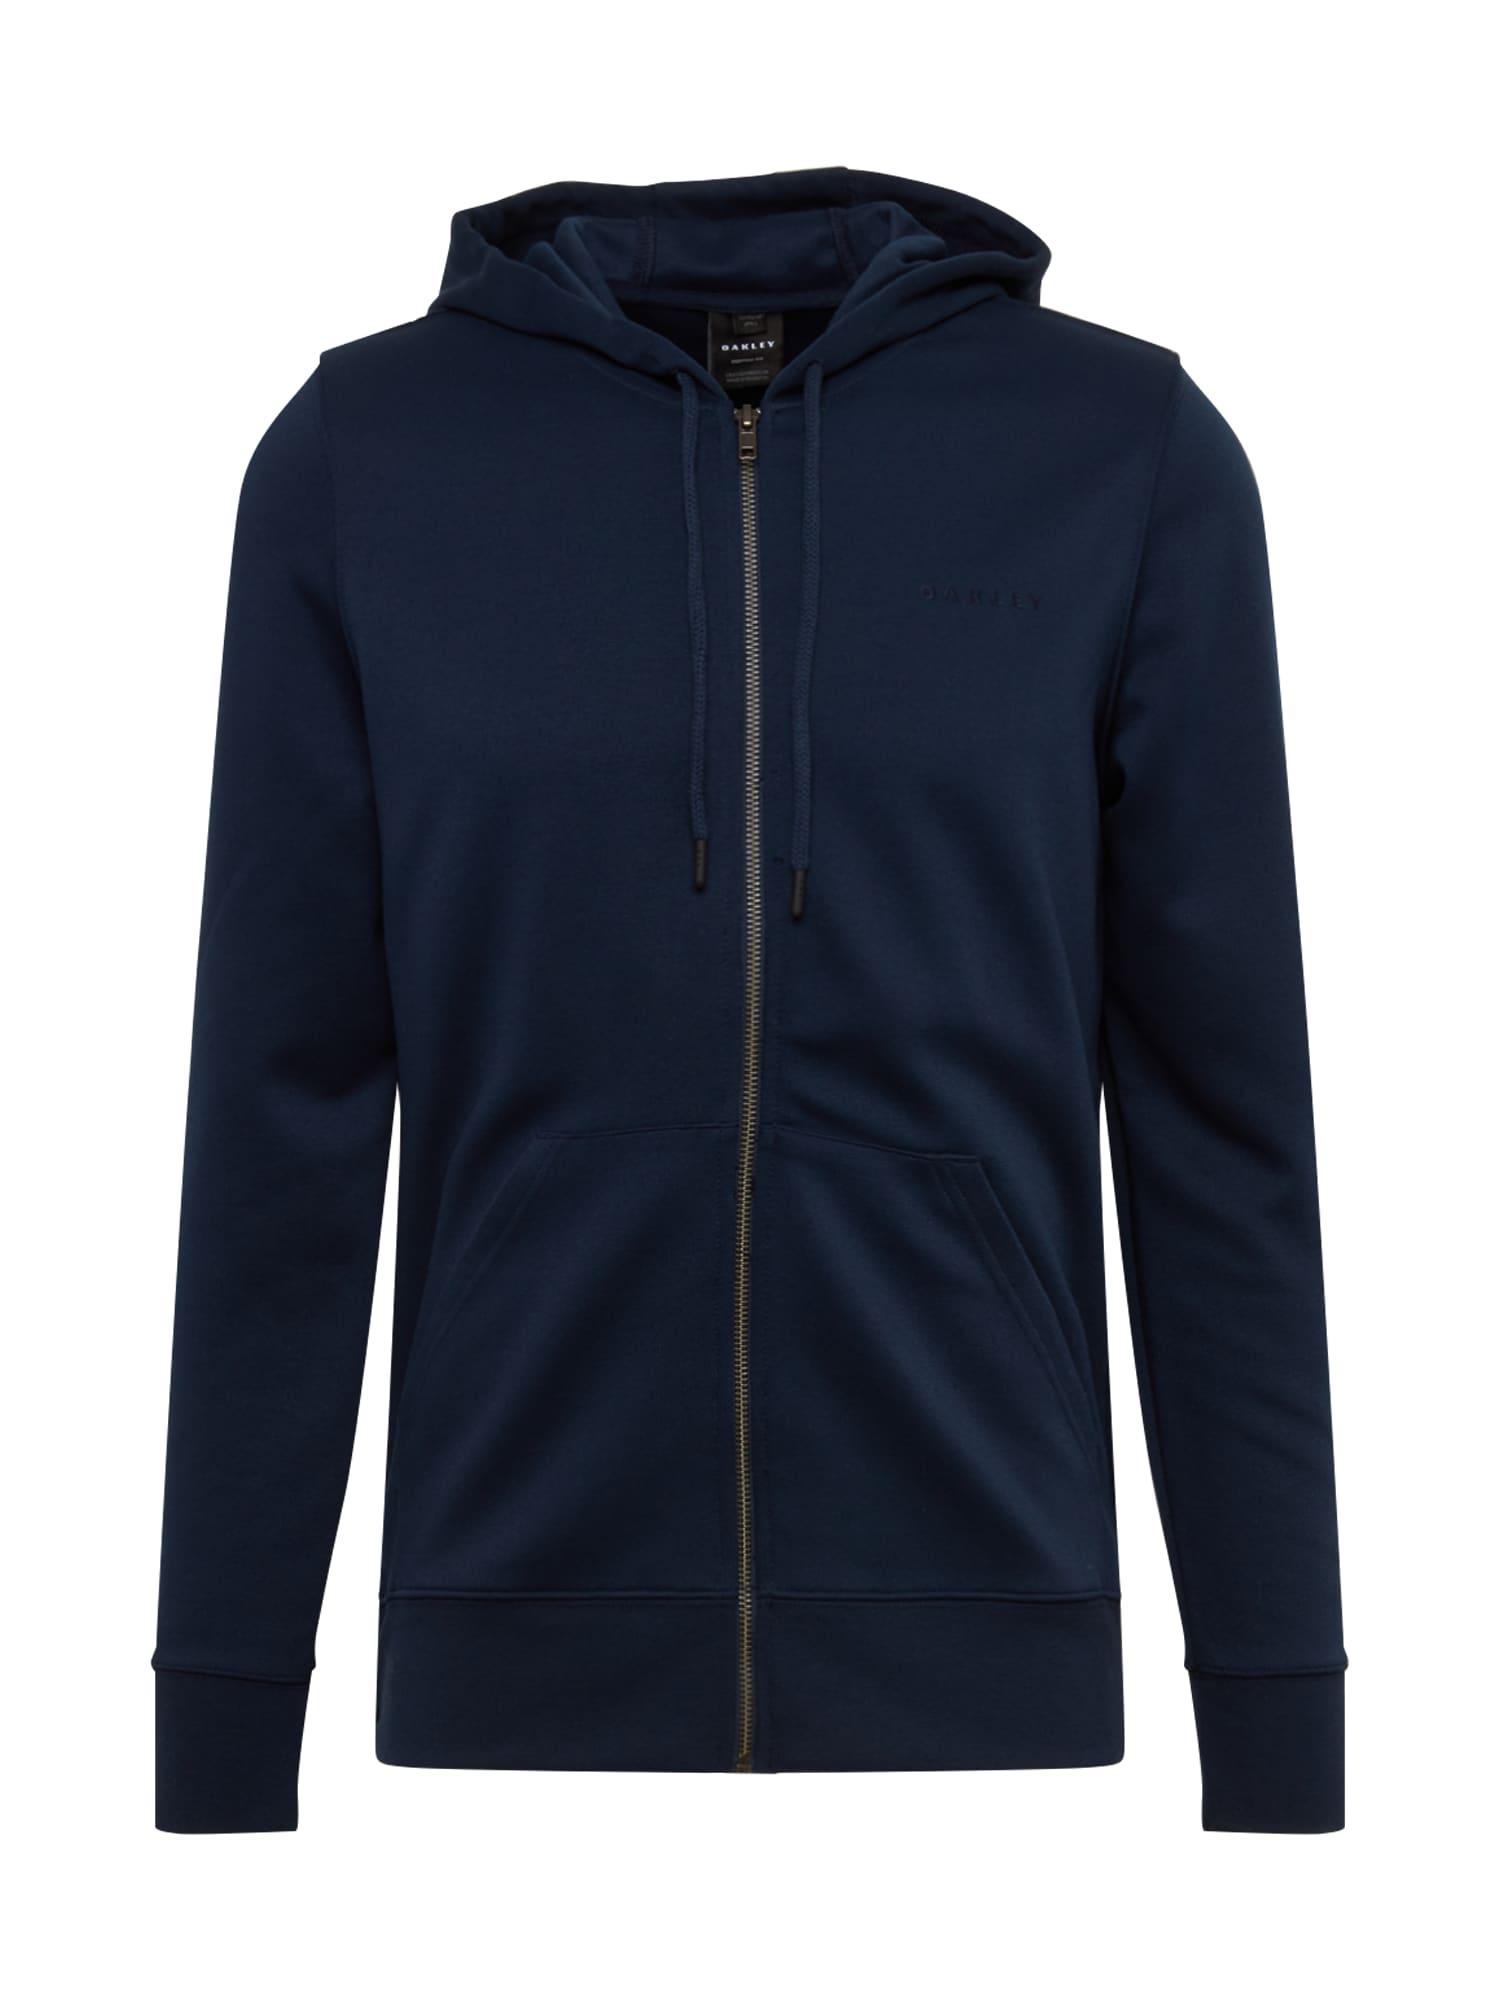 OAKLEY Sportinis džemperis 'FULL FLEX PERFORMANCE' nakties mėlyna